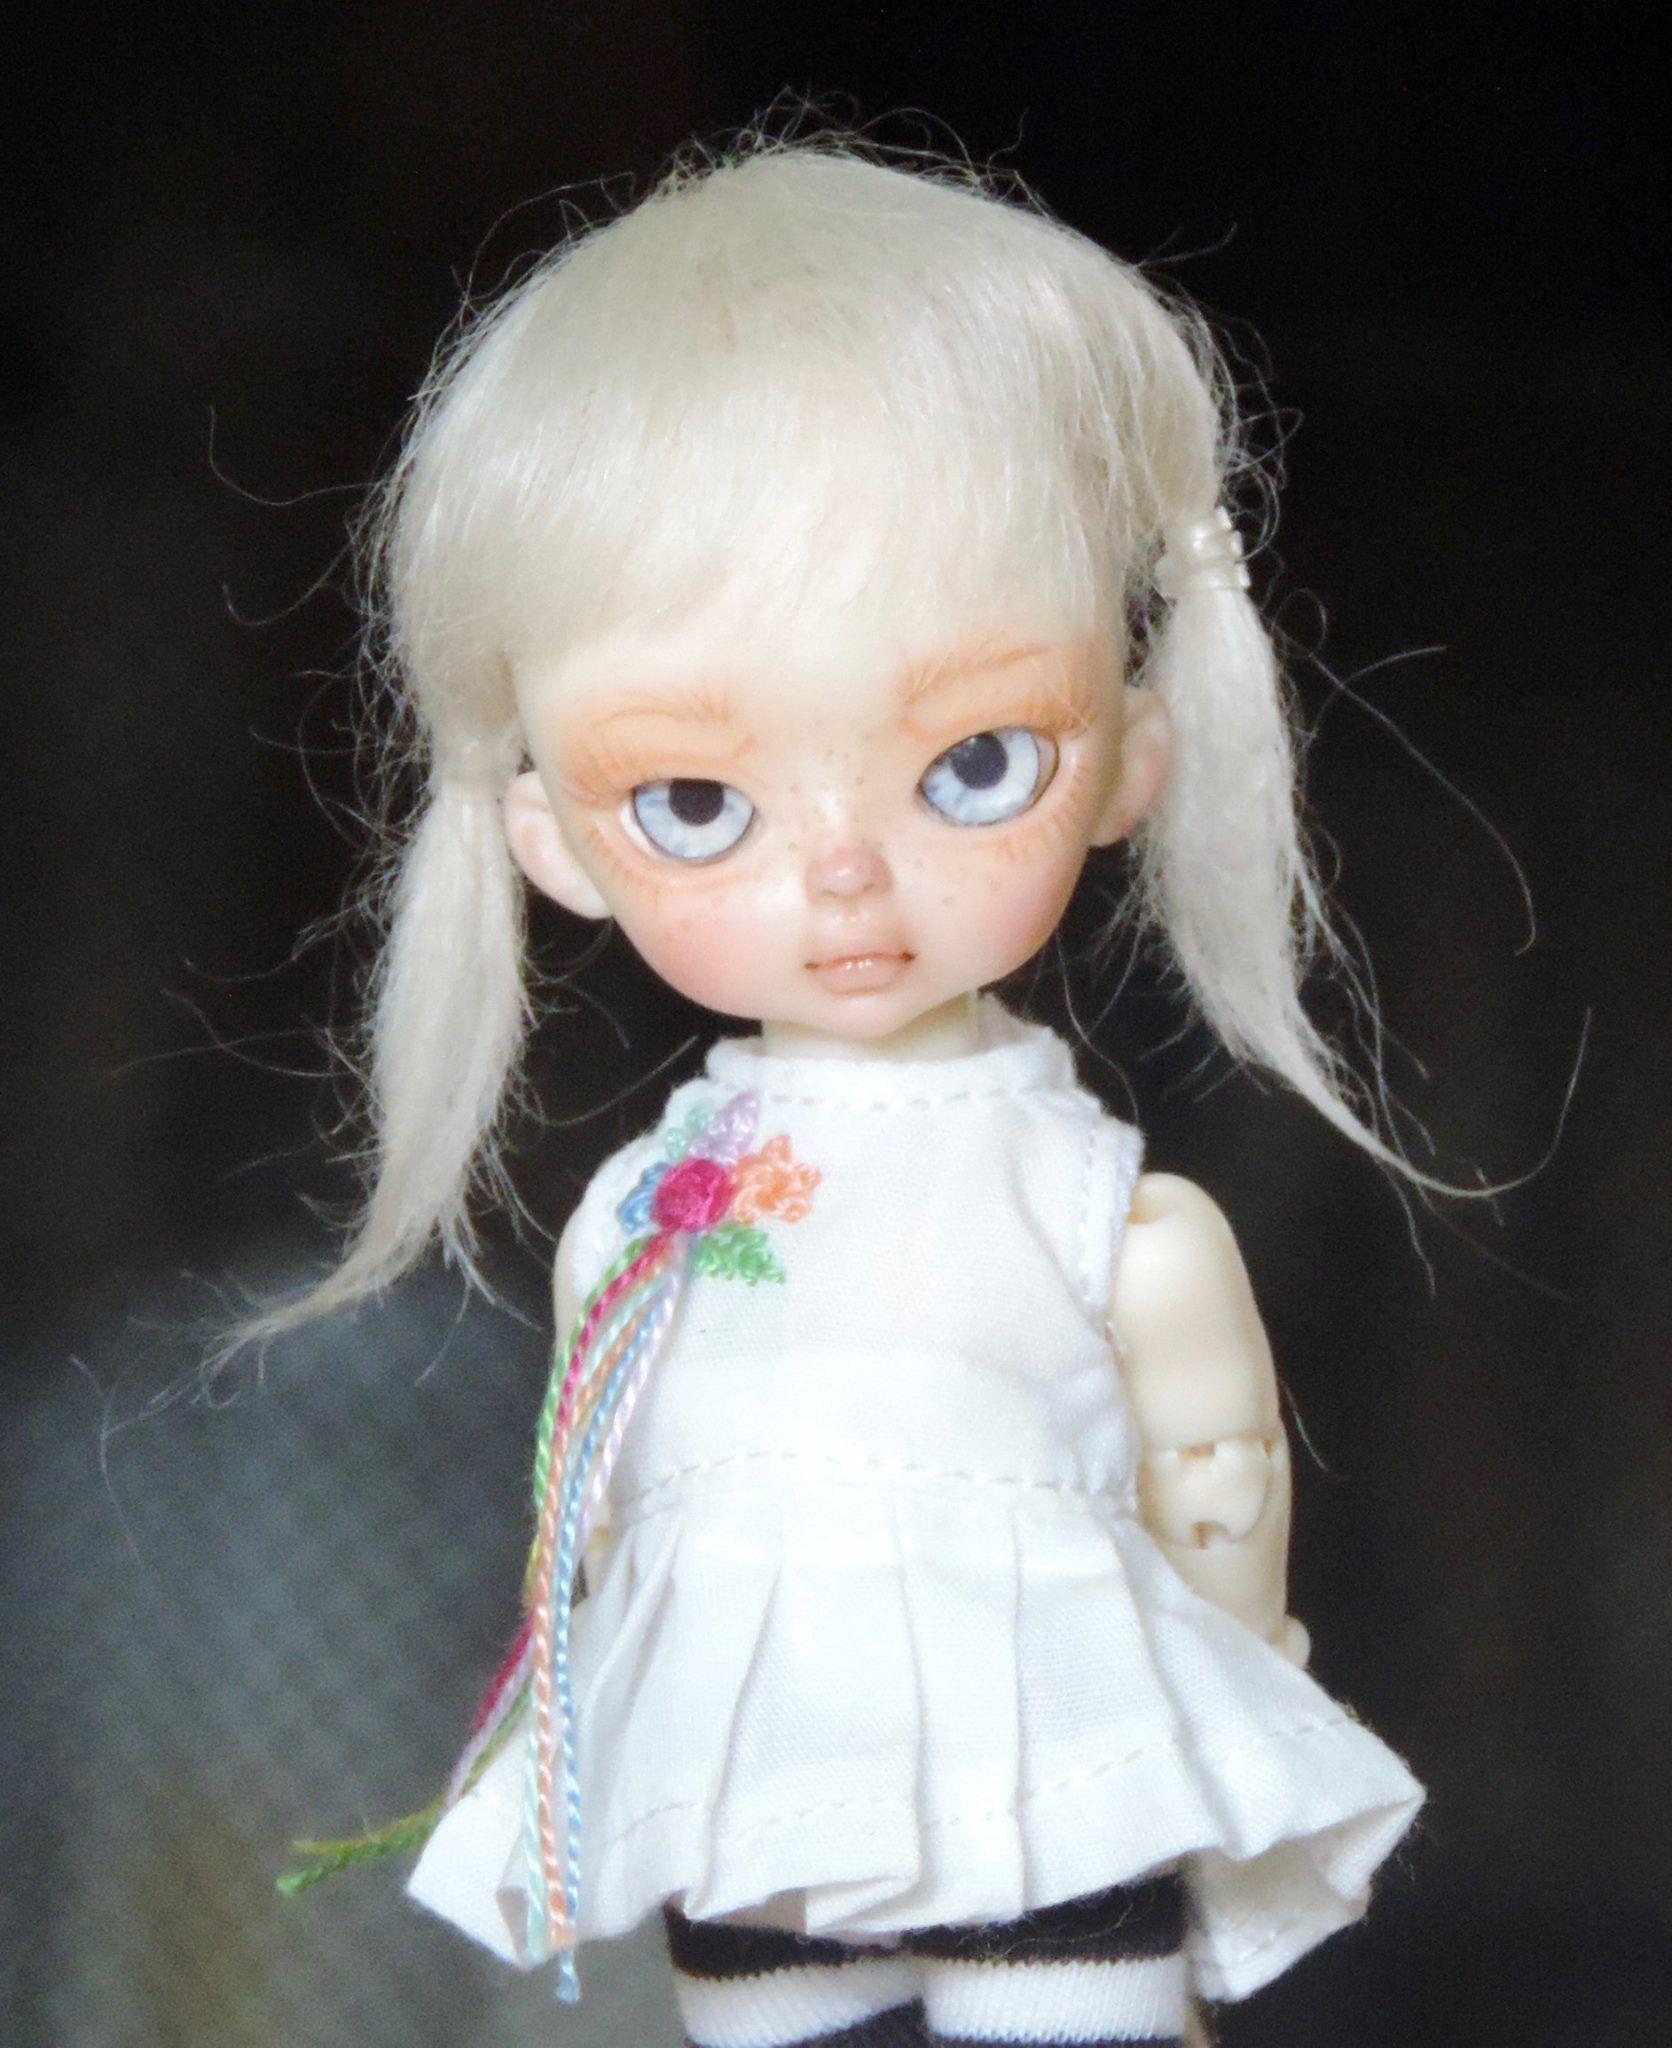 Realistic Doll Eyes Petite /& Pullip Eye Chips Middie Blythe Eye Chips Custom Blythe Doll Eye Chips Blythe Custom Blythe Eyes D46